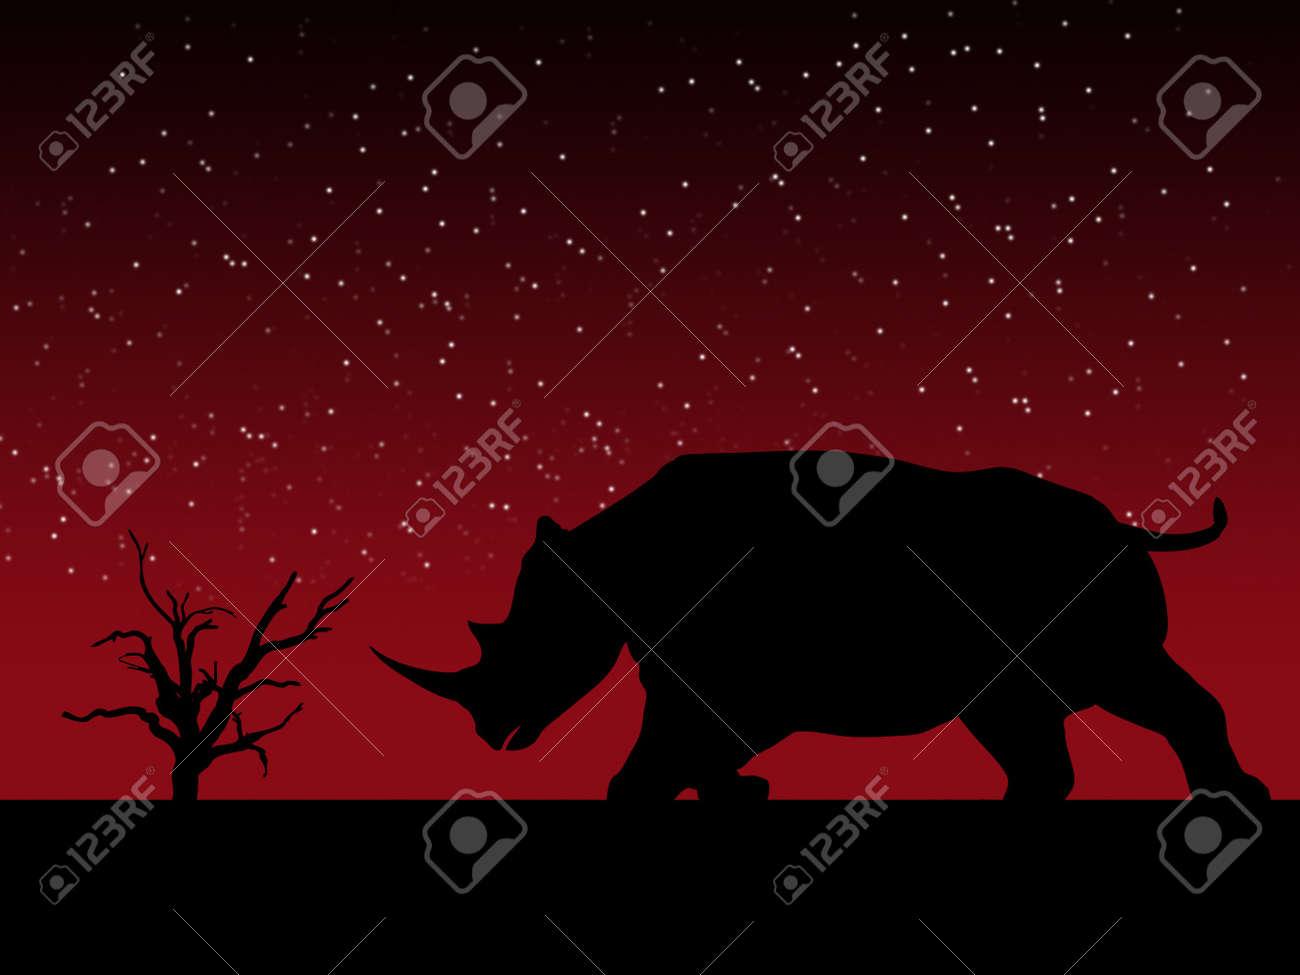 A powerful Rhino against a sky background